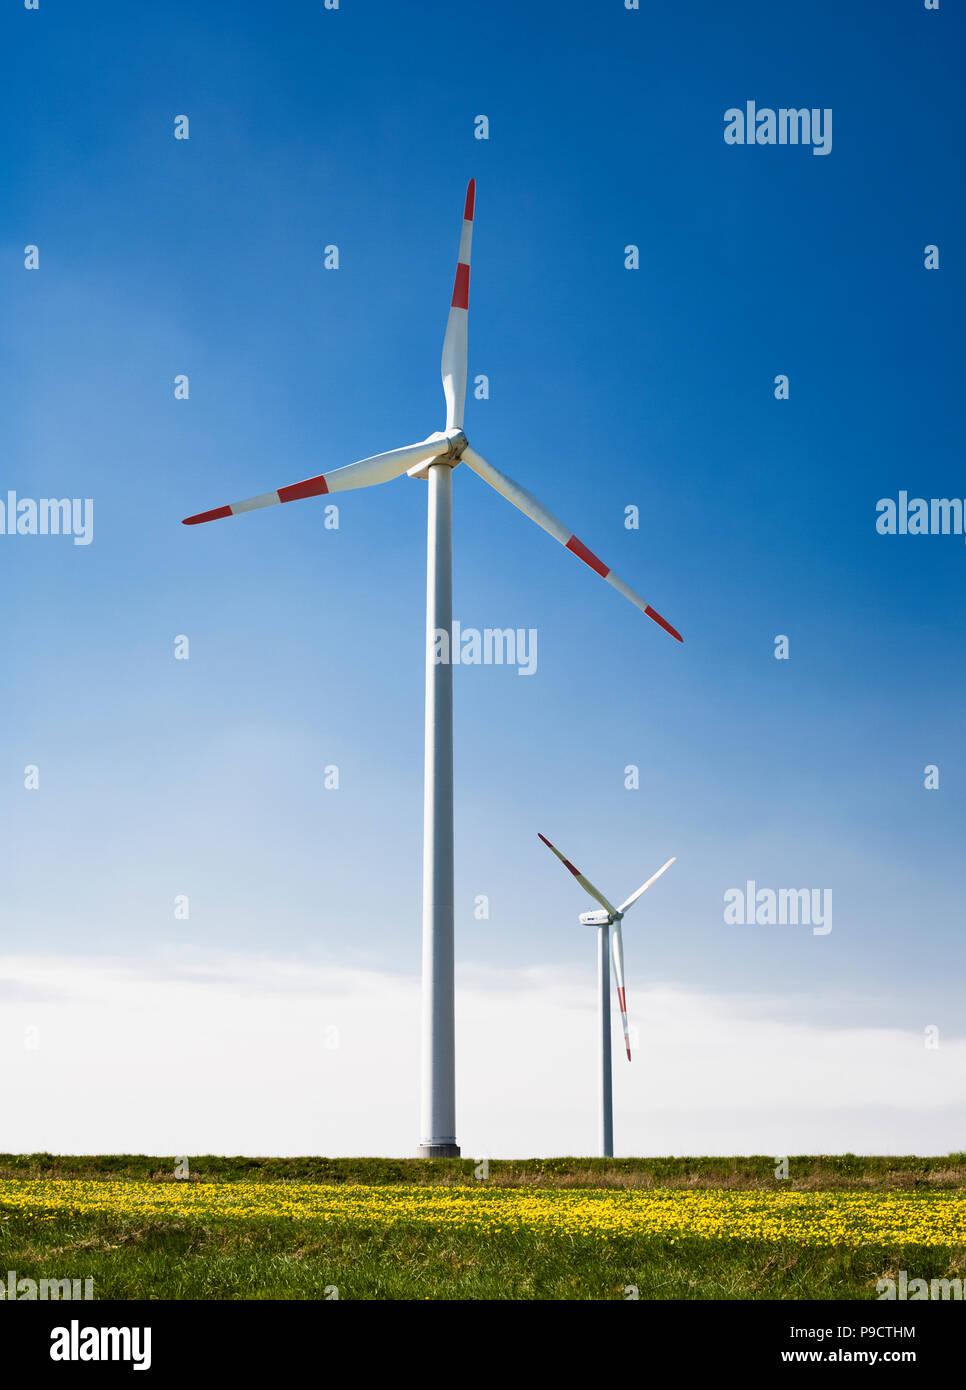 Windfarm wind turbine Schleiden Schoneseiffen in the Deutsch Belgischer Naturpark, Eifel region, Germany, Europe - Stock Image